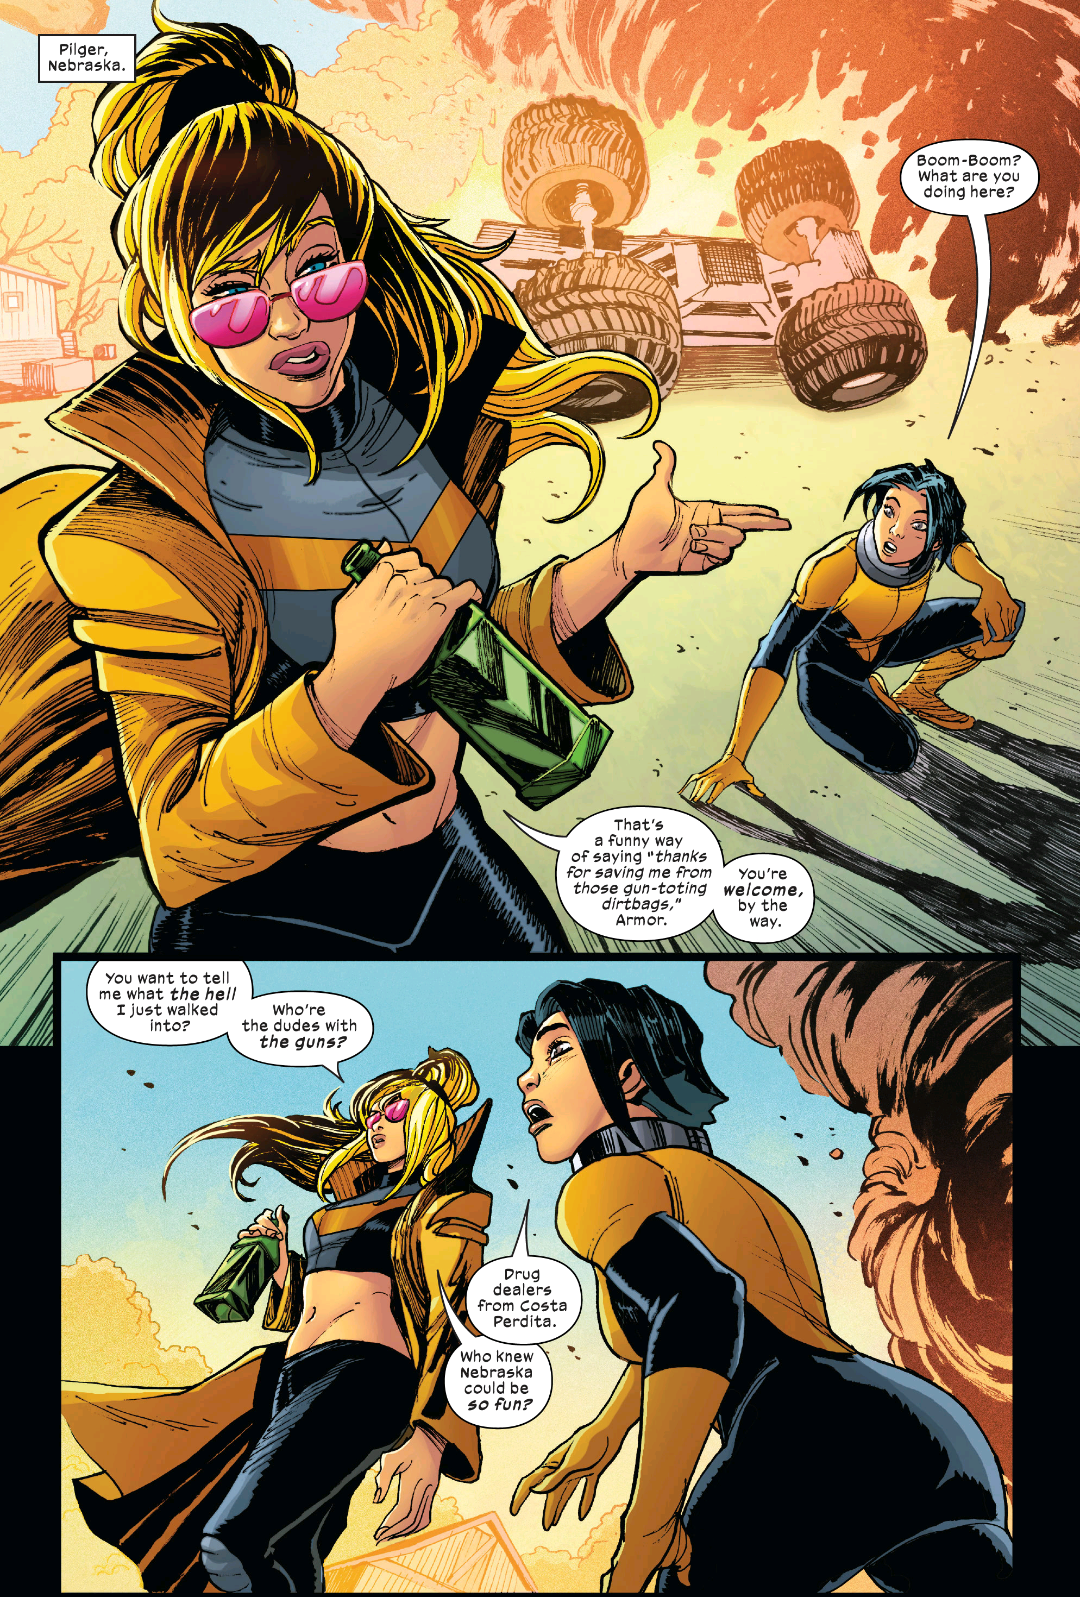 New Mutants #6 - Marvel (2020)